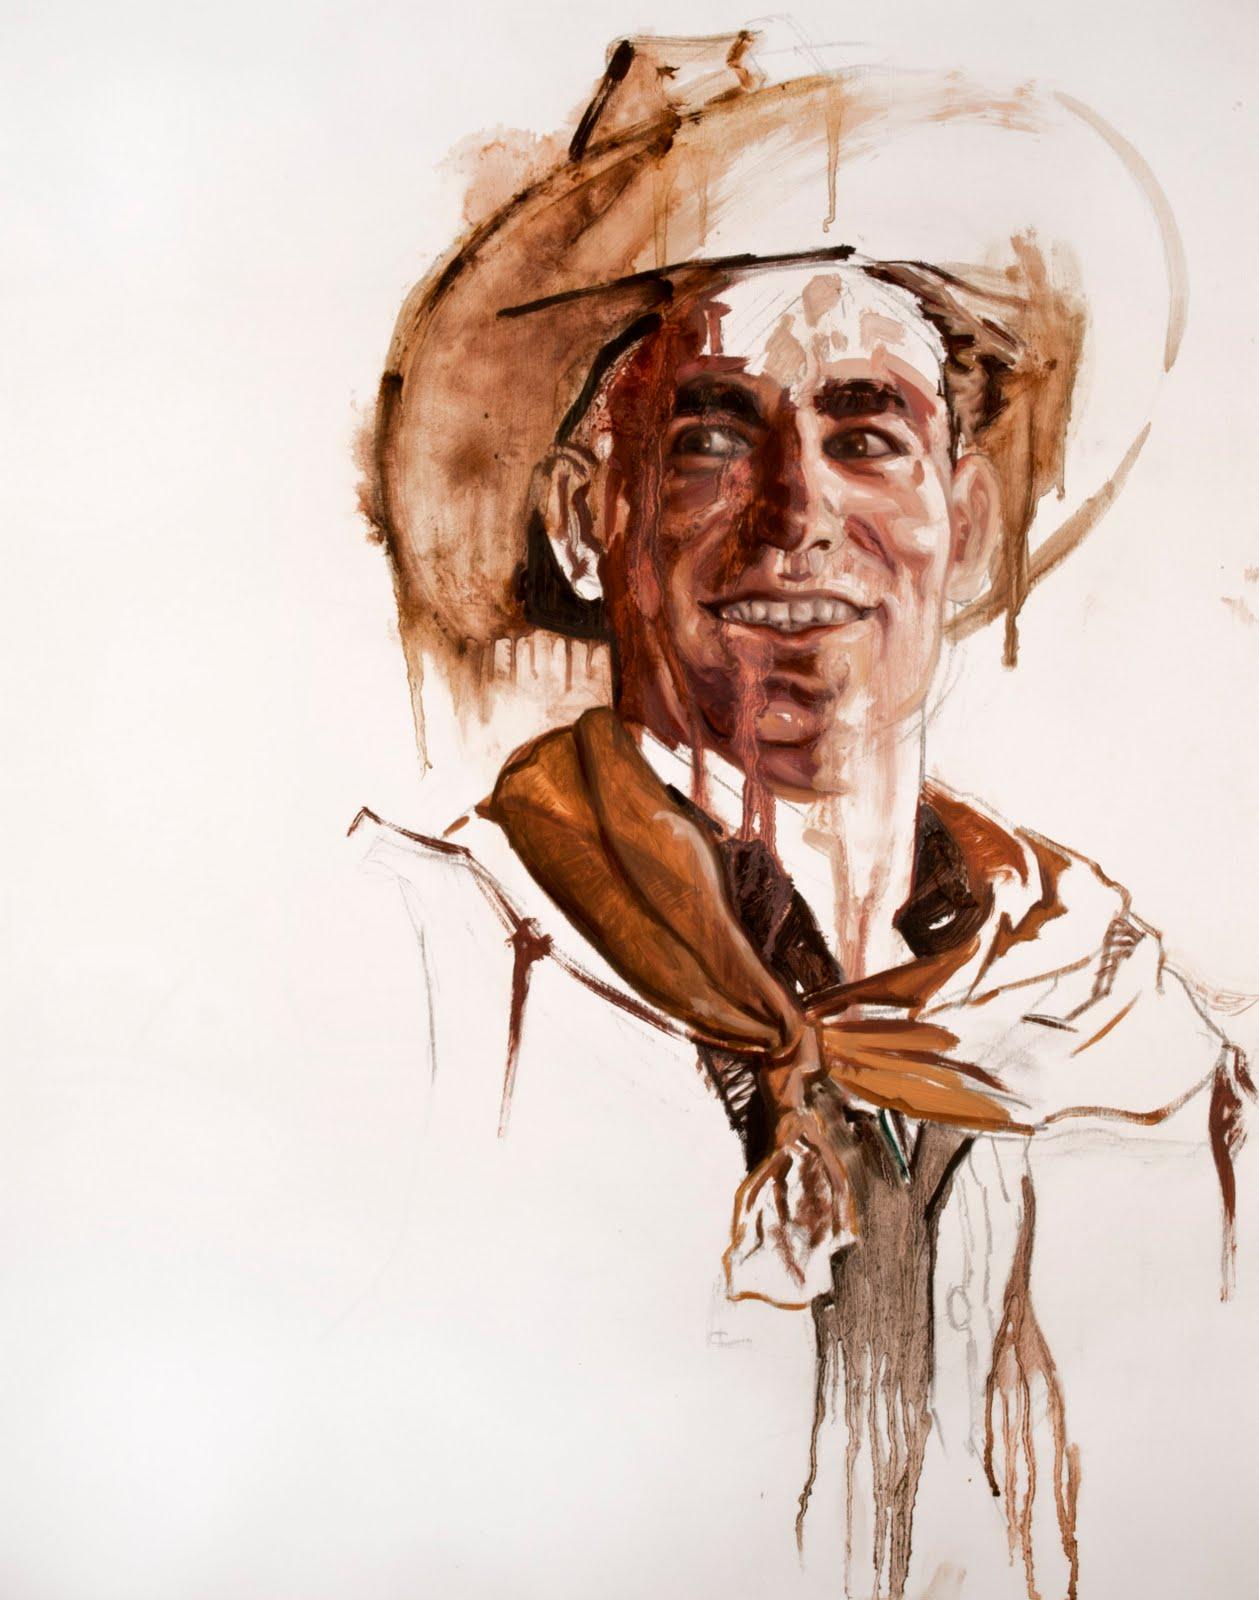 "Cowboy 9 Oil on Panel 20"" x 16"" 2012"